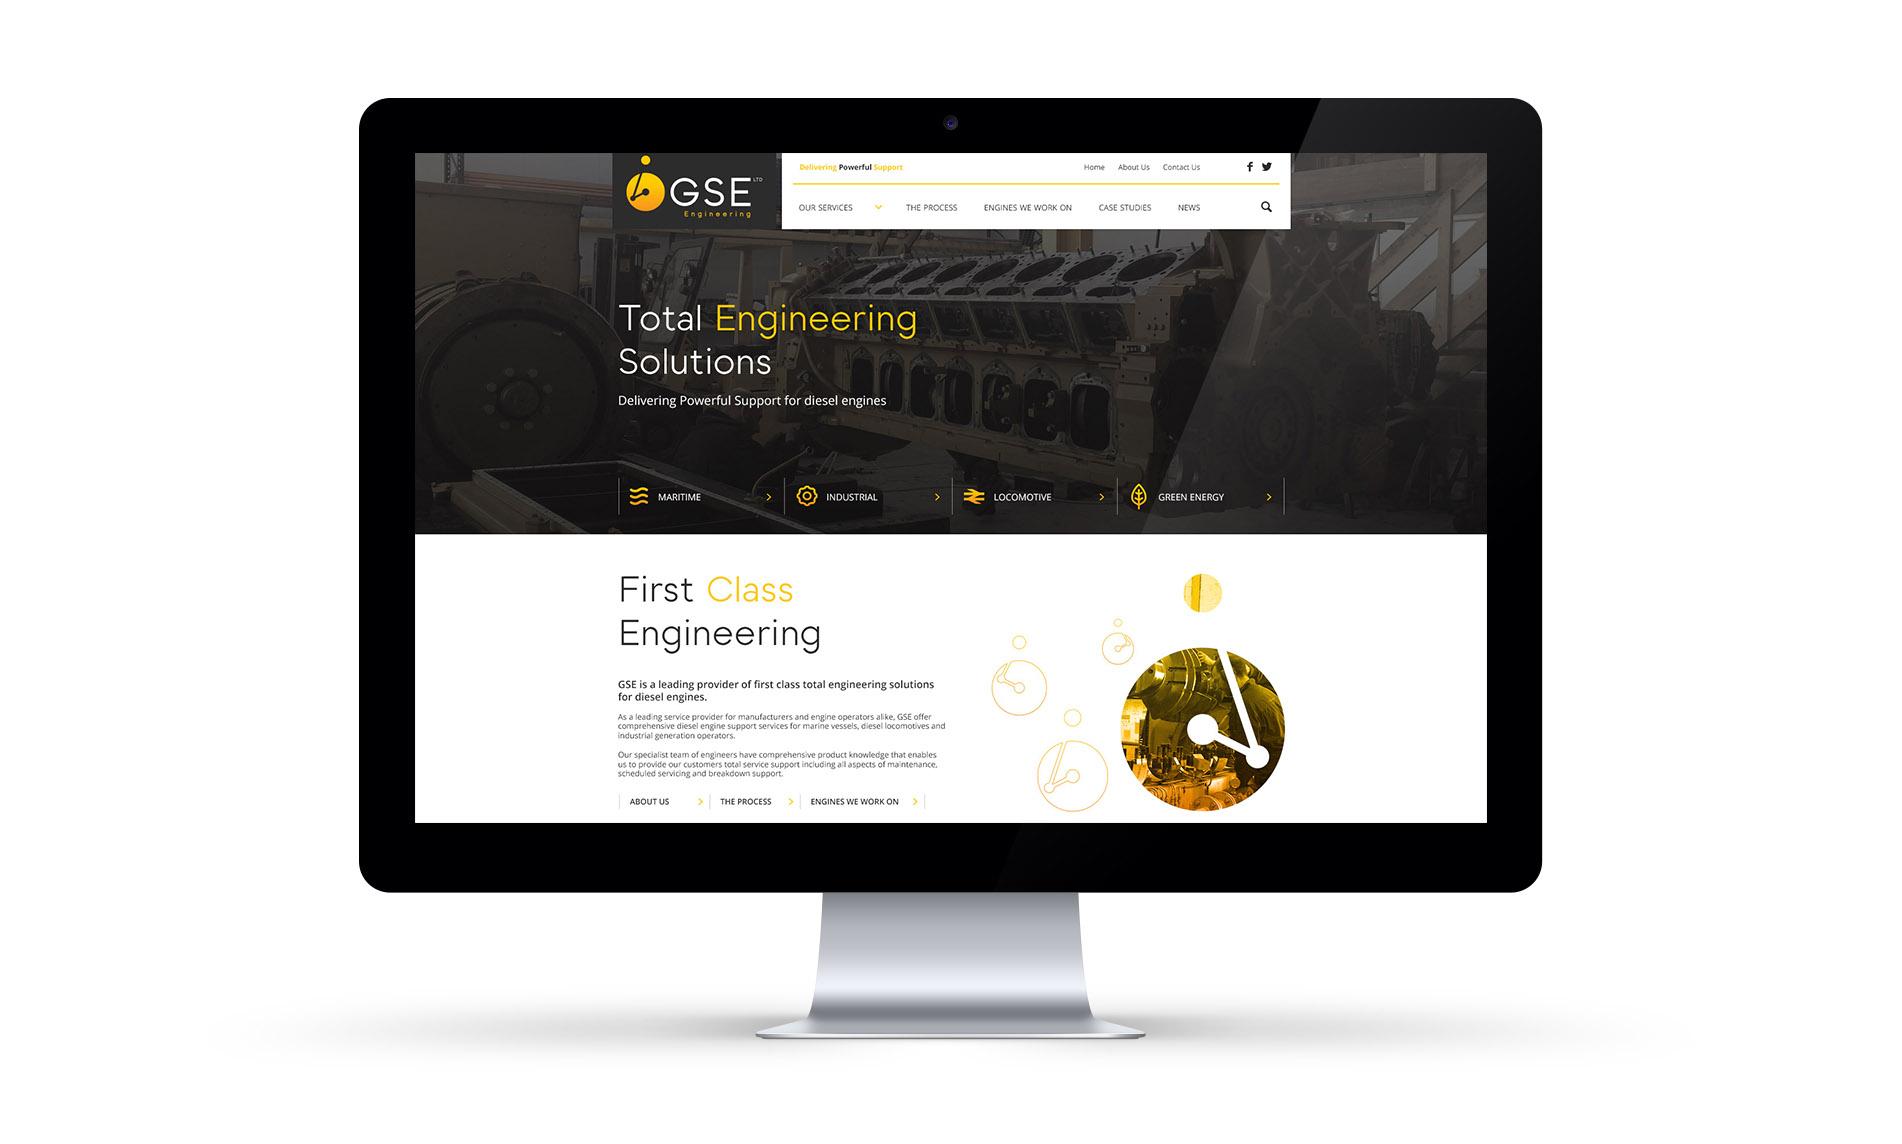 The Farm Factory - Our Graphic, Web Design & Development